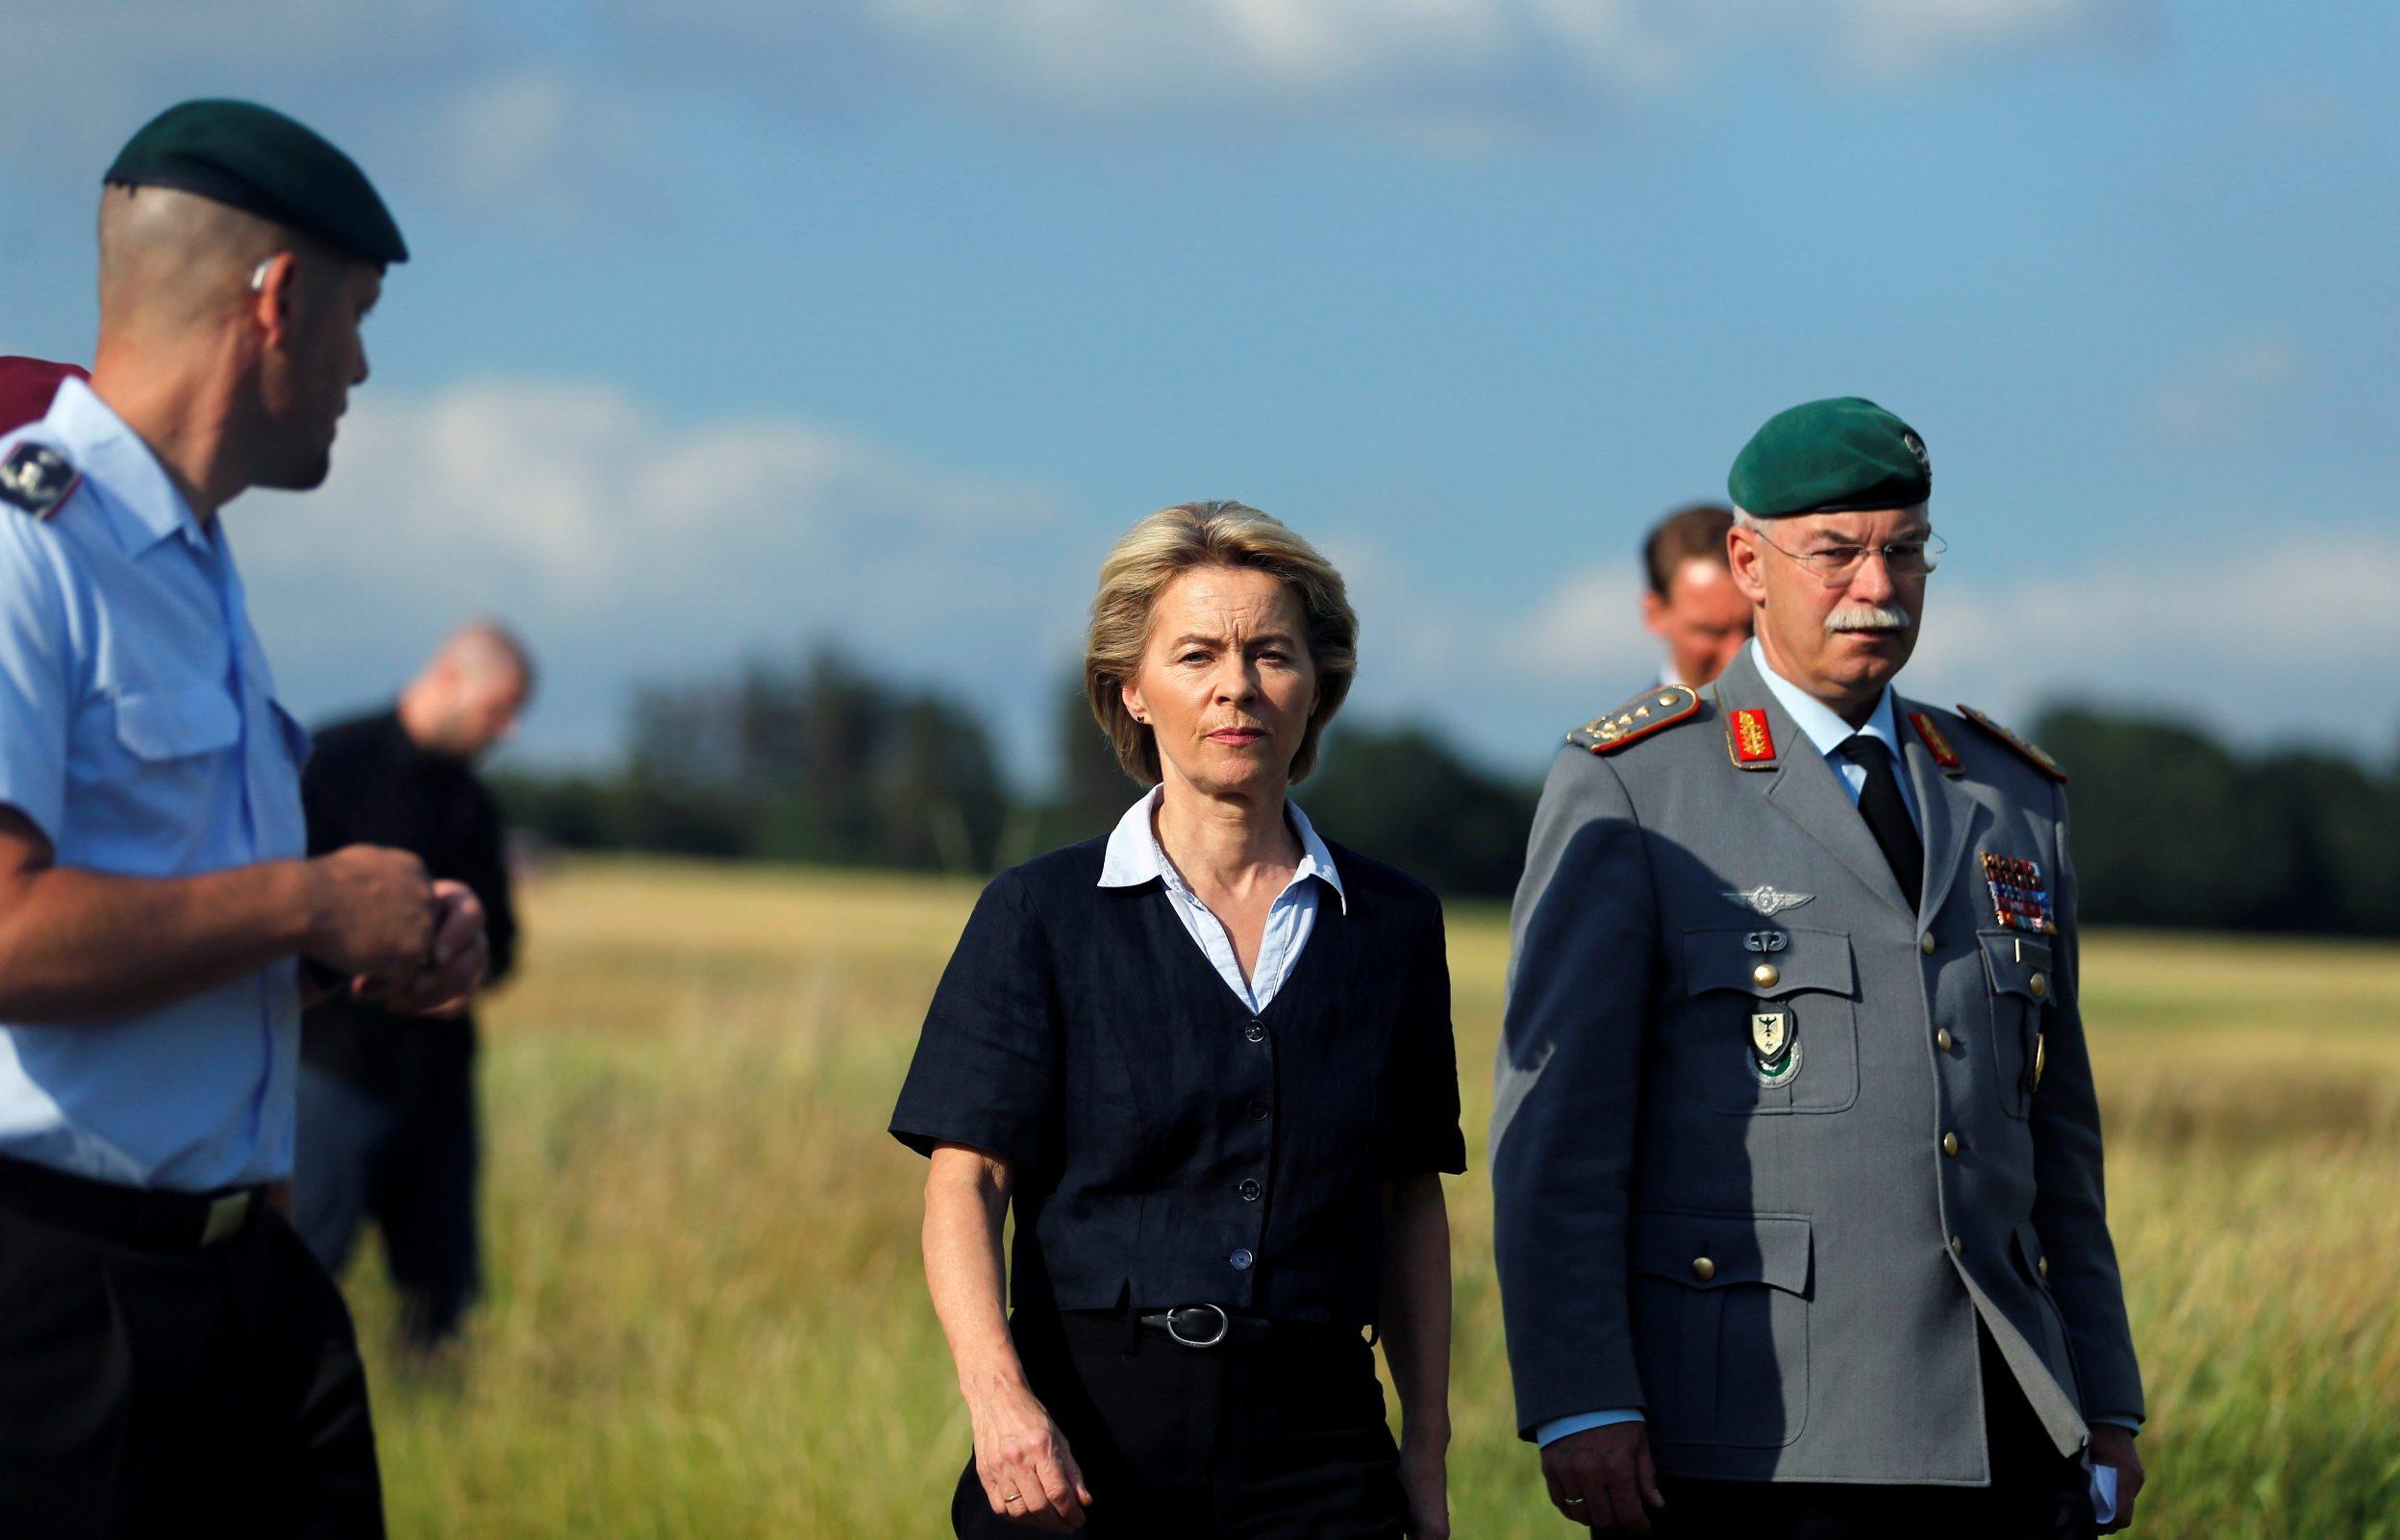 German Minister of Defence Ursula von der Leyen visits the site where German armed forces helicopter crashed in Dehmke near Hanover, Germany, July 1, 2019 REUTERS/Leon Kuegeler